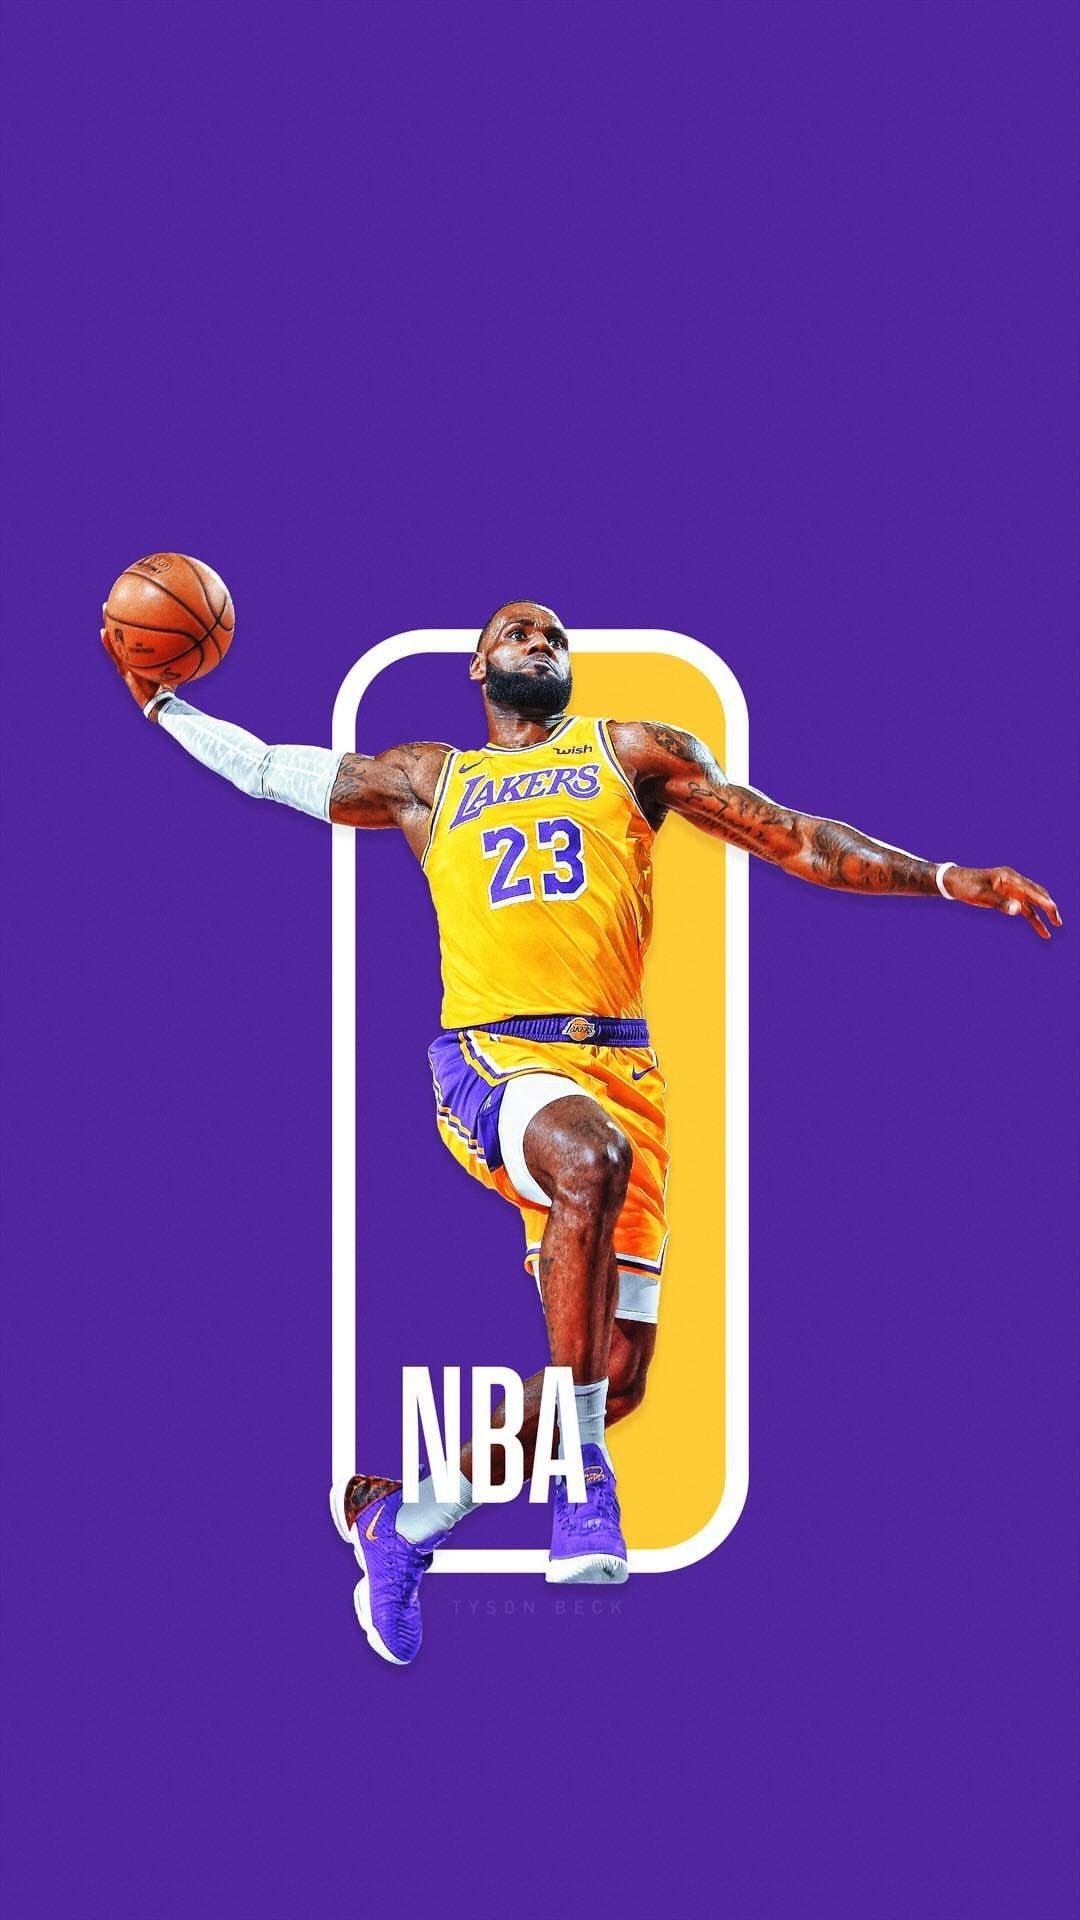 LeBron James Wallpaper Lebron james wallpapers, Nba logo